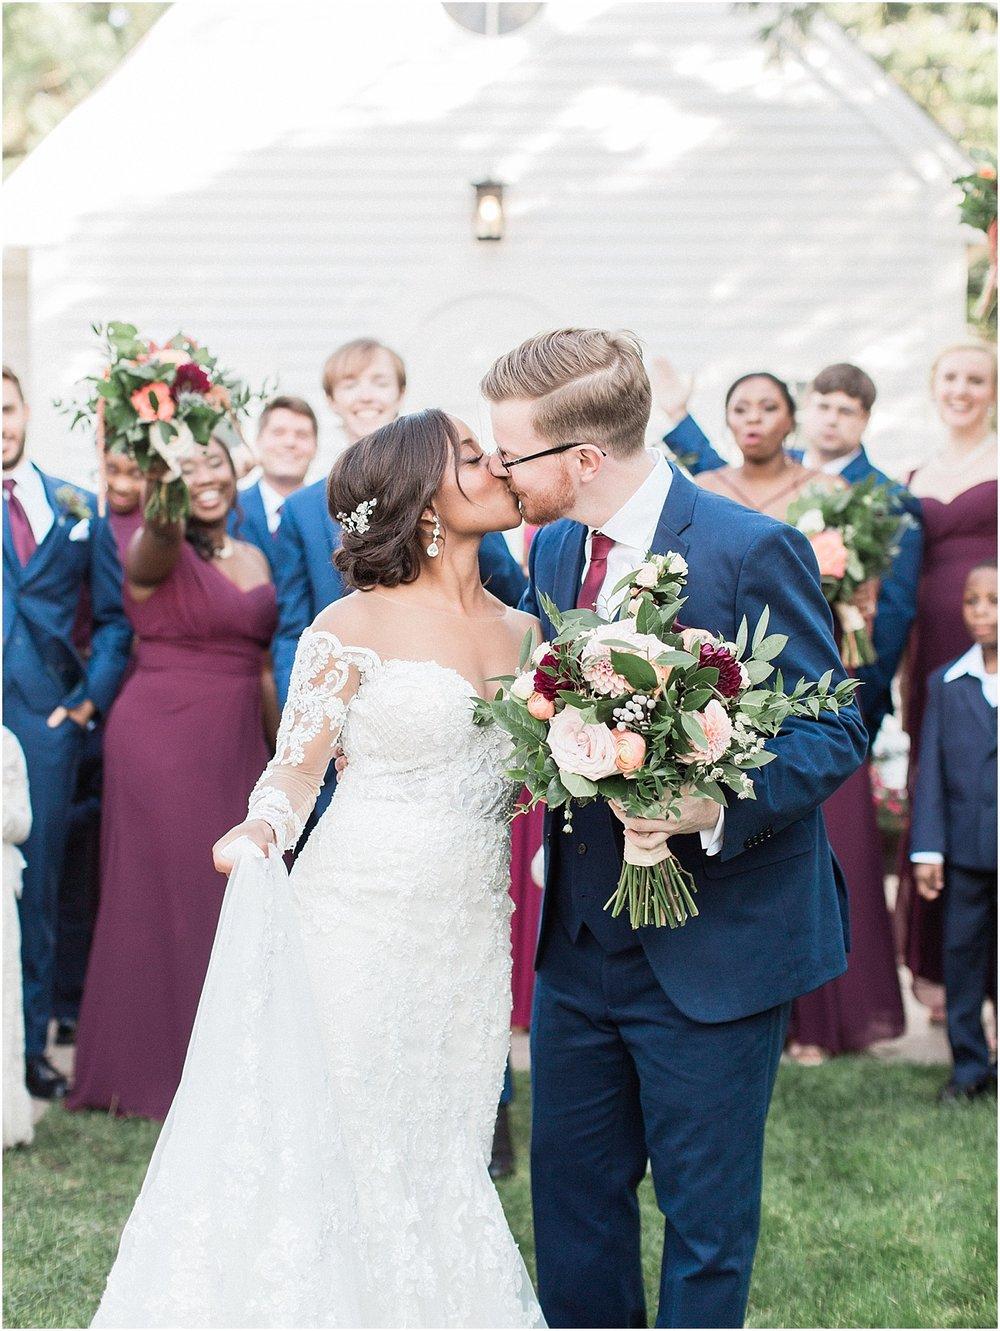 melissa_dan_the_pavilion_at_pine_hills_fall_wine_cape_cod_boston_wedding_photographer_meredith_jane_photography_photo_1215.jpg